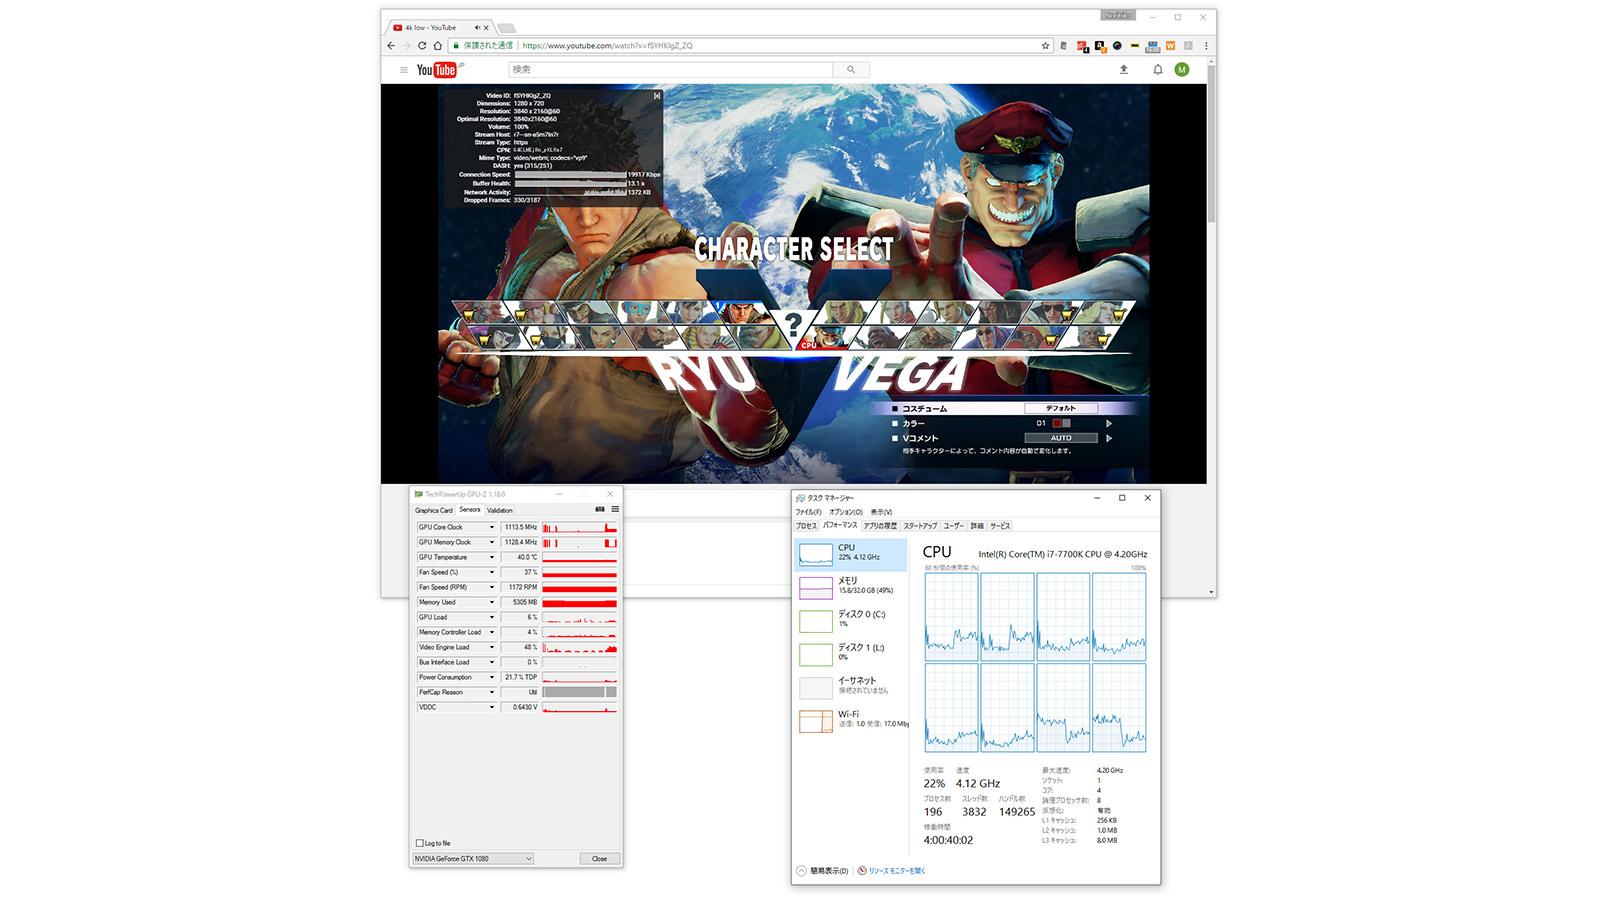 YouTubeで4K60p動画再生時のシステムの負荷